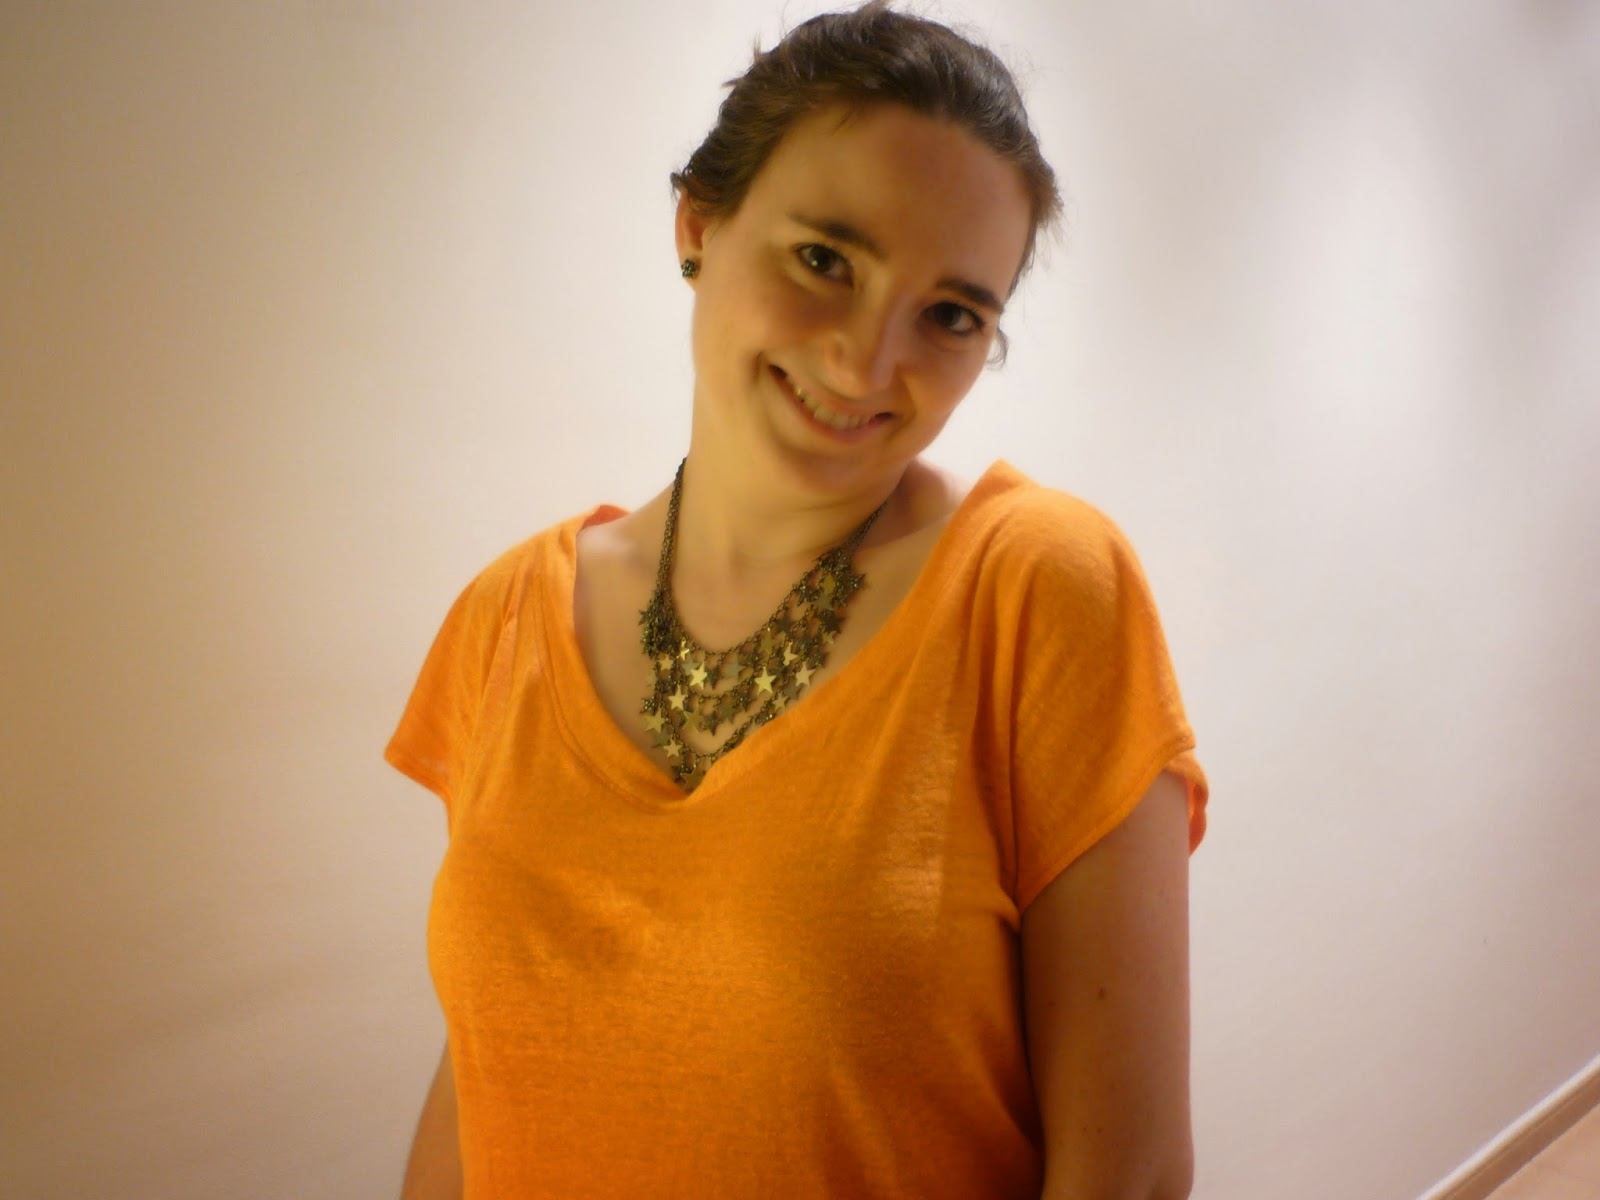 modistilla de pacotilla camiseta punto lino naranja kirsten kimono tshirt